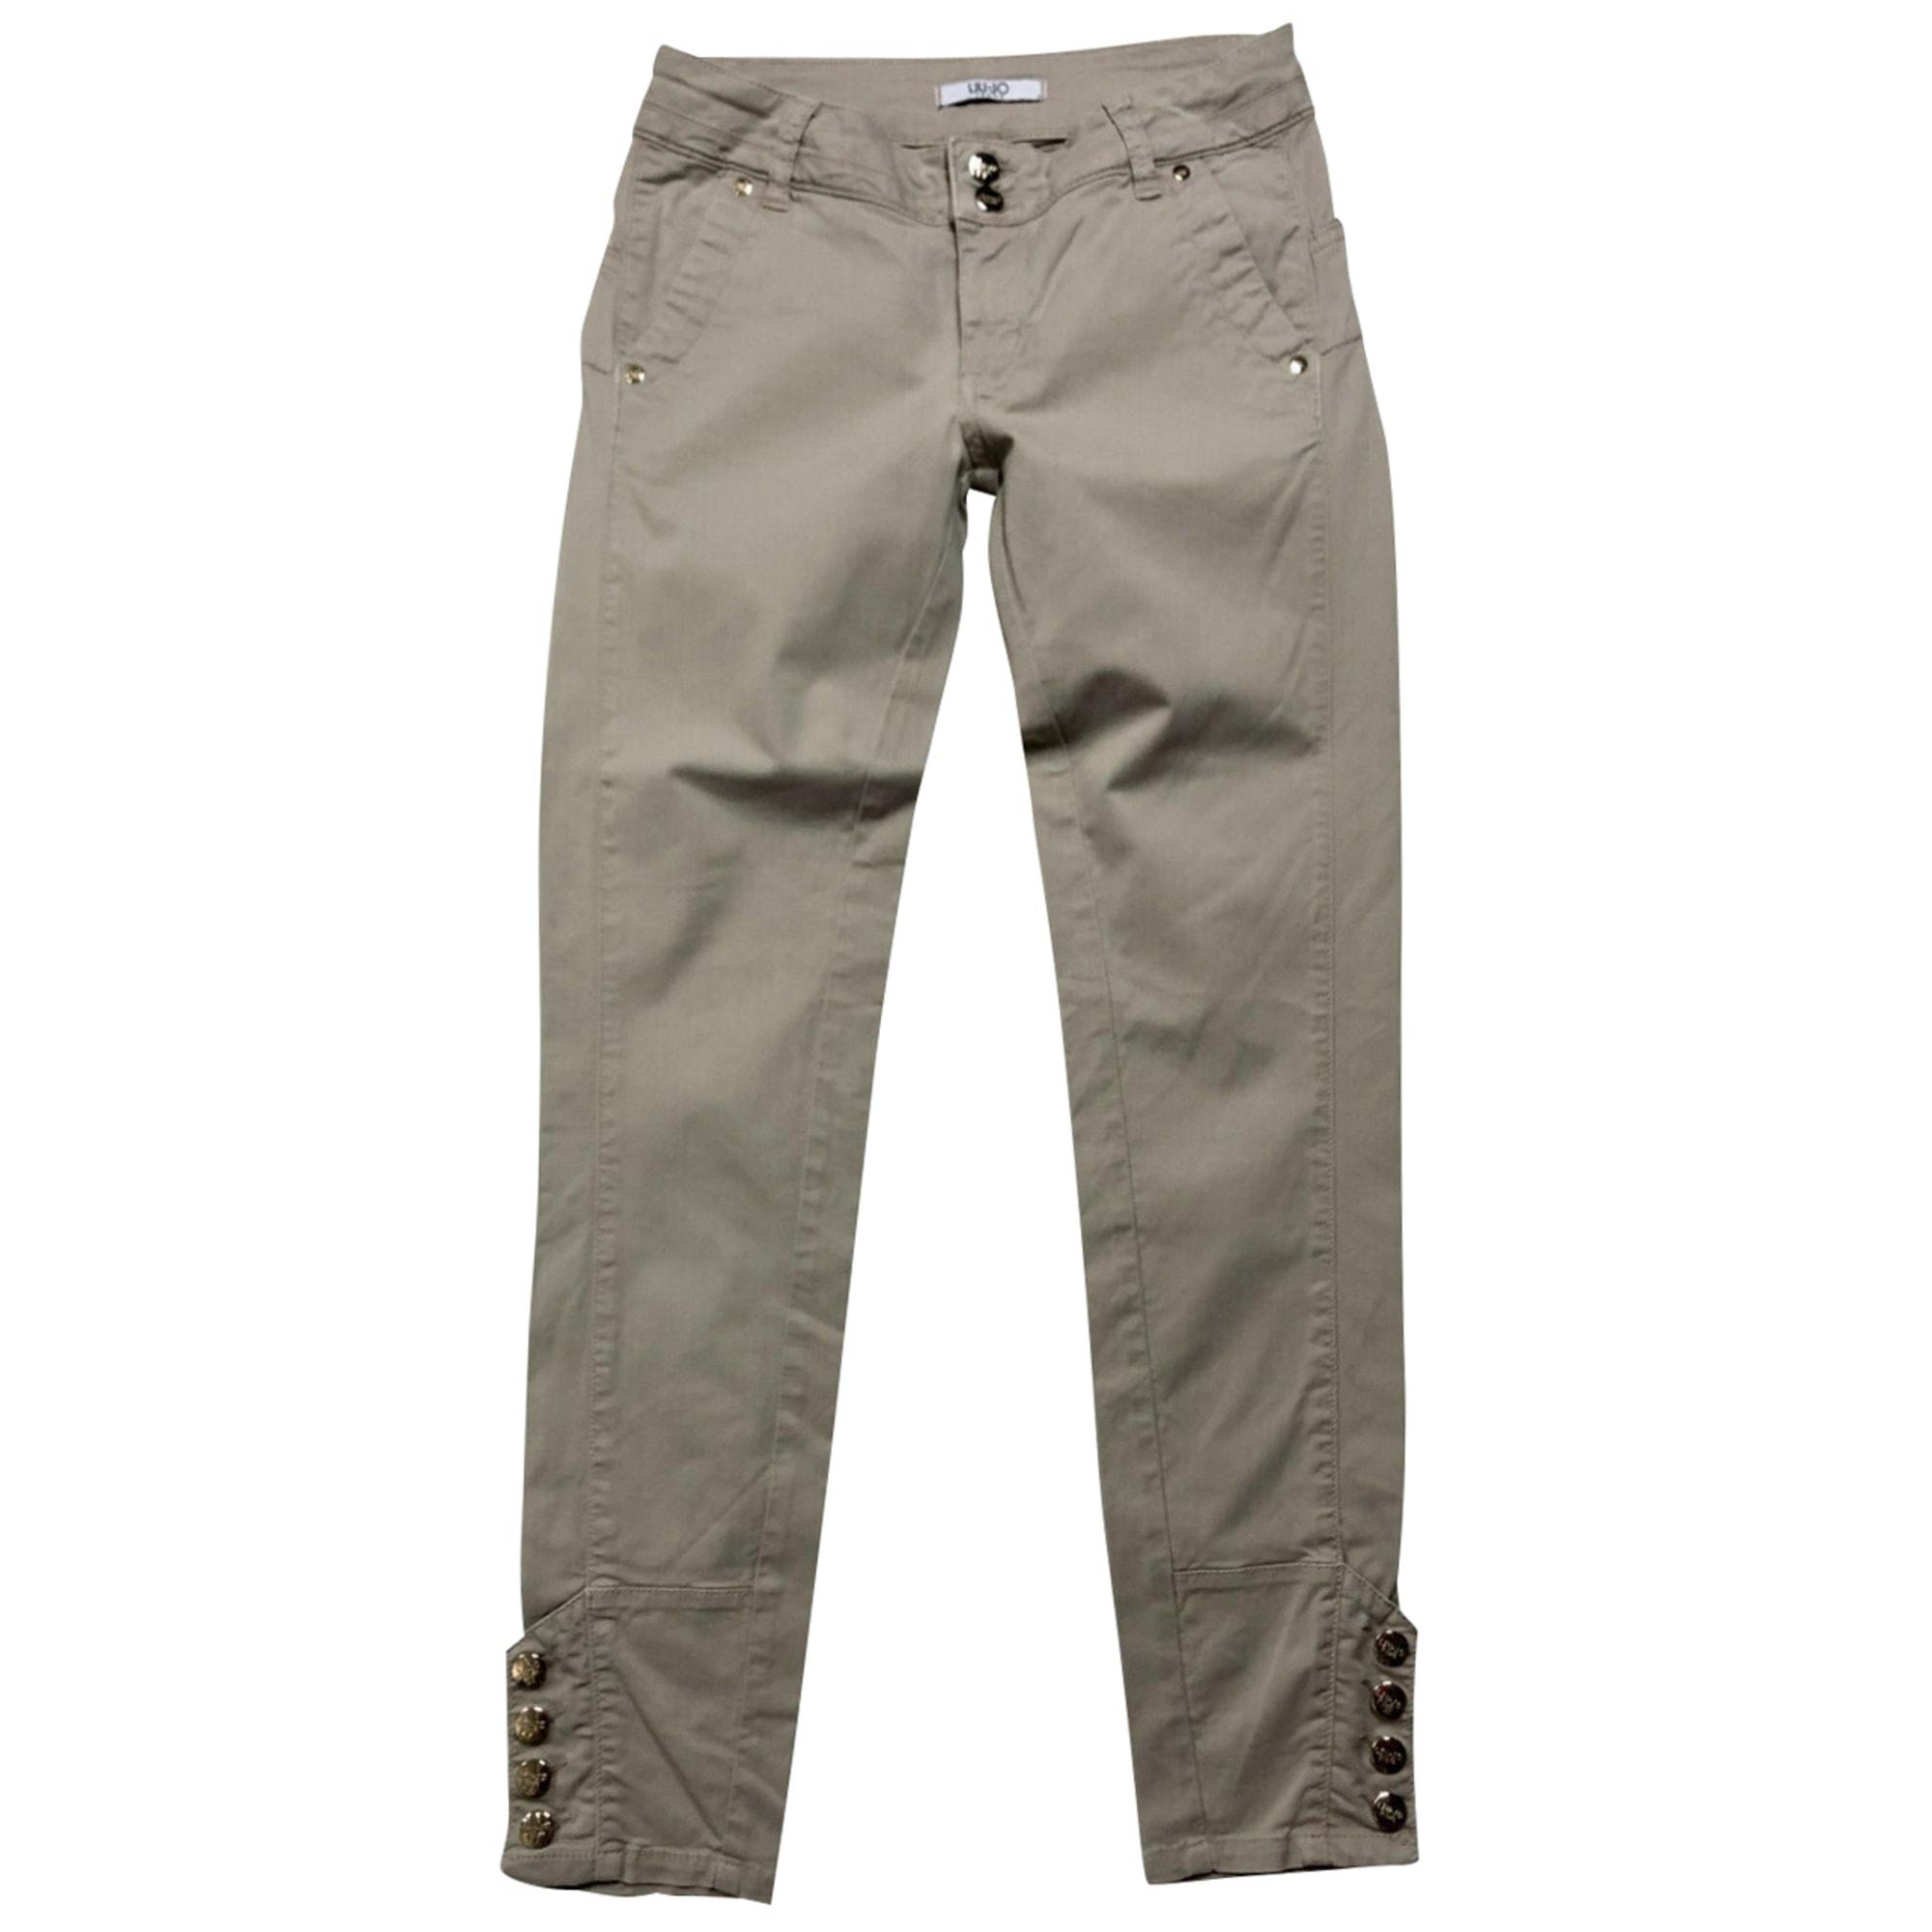 Pantalon droit LIU JO Beige, camel